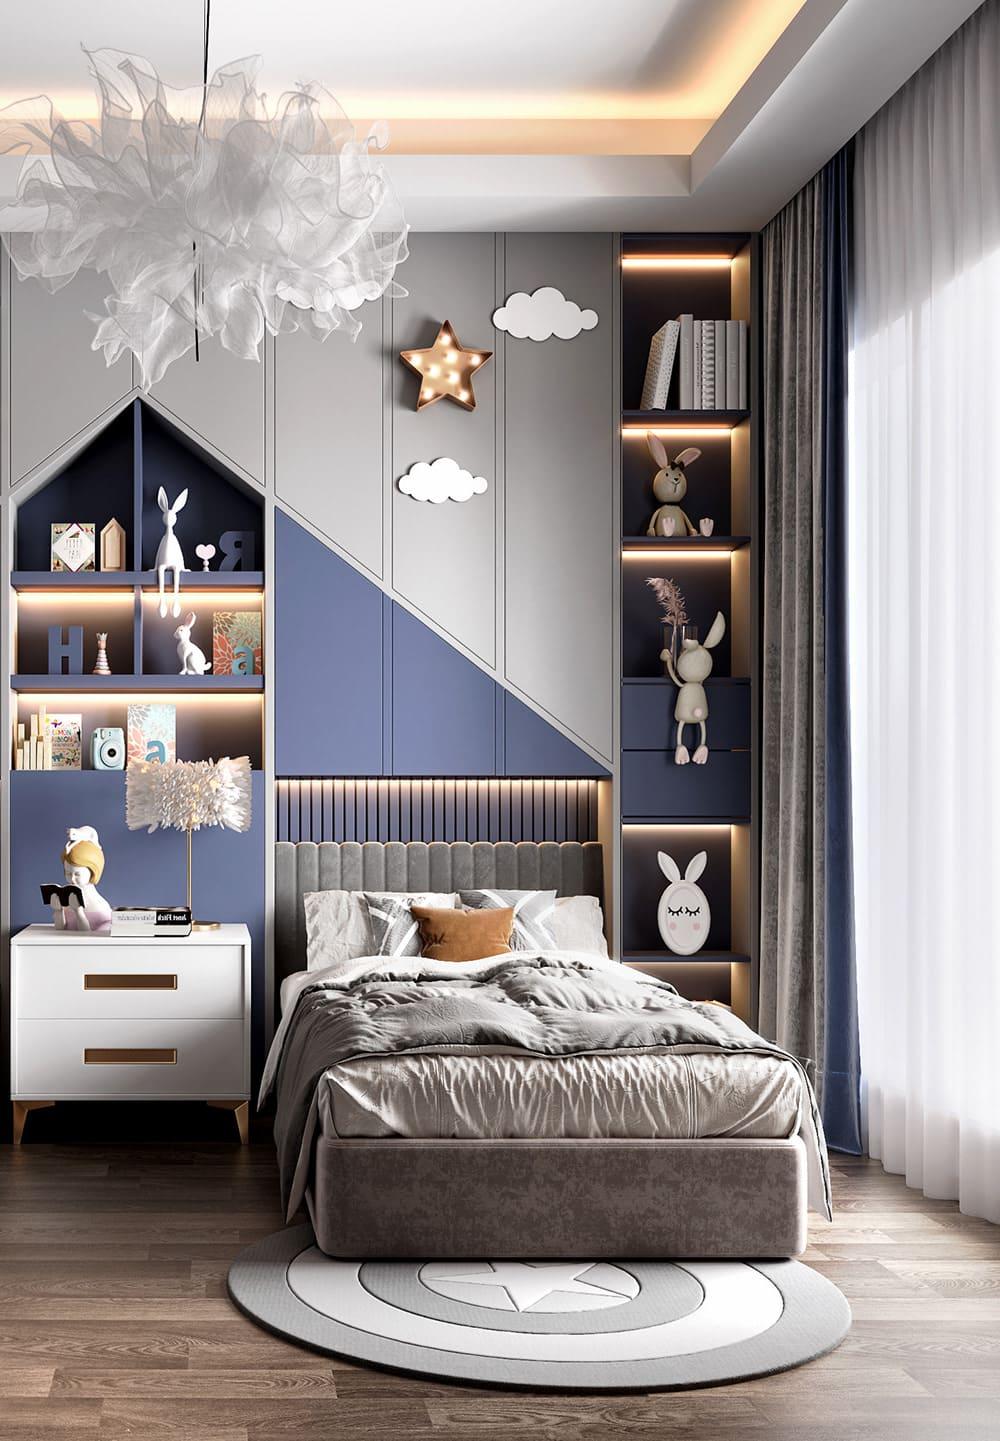 интерьер детской комнаты фото 17